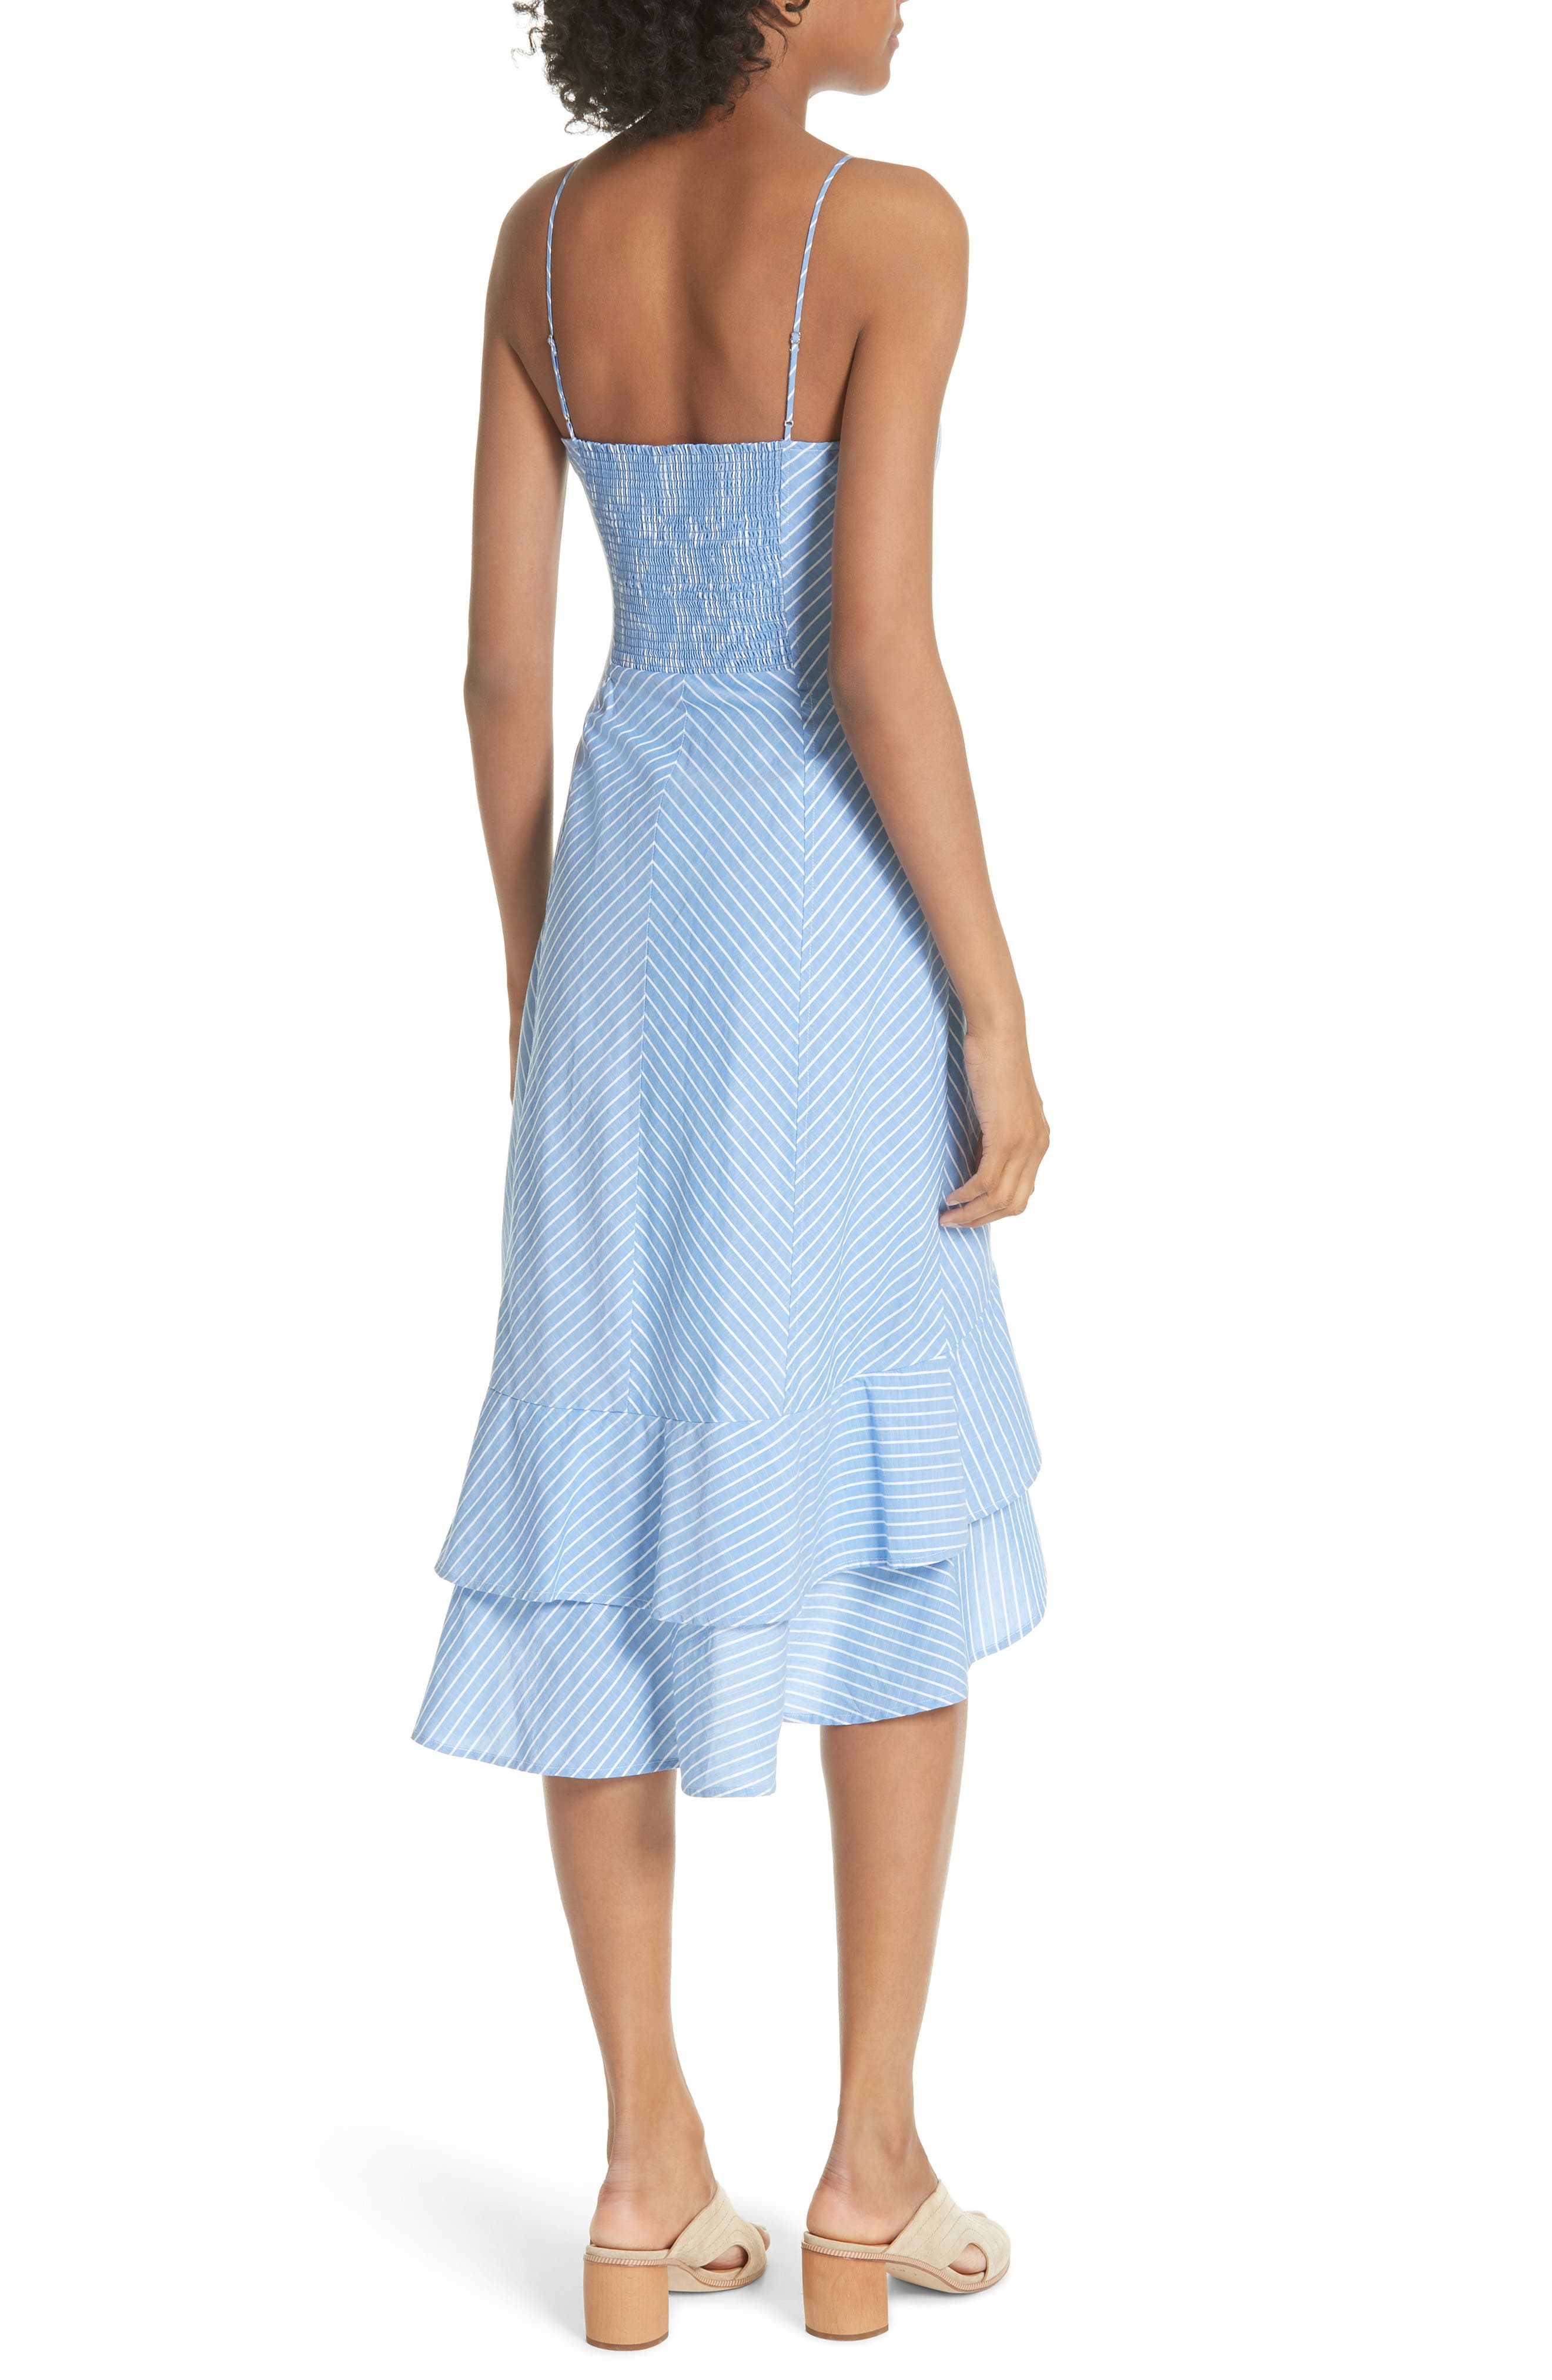 Eberta Stripe High/Low Dress,                             Alternate thumbnail 2, color,                             FRENCH CHAMBRAY